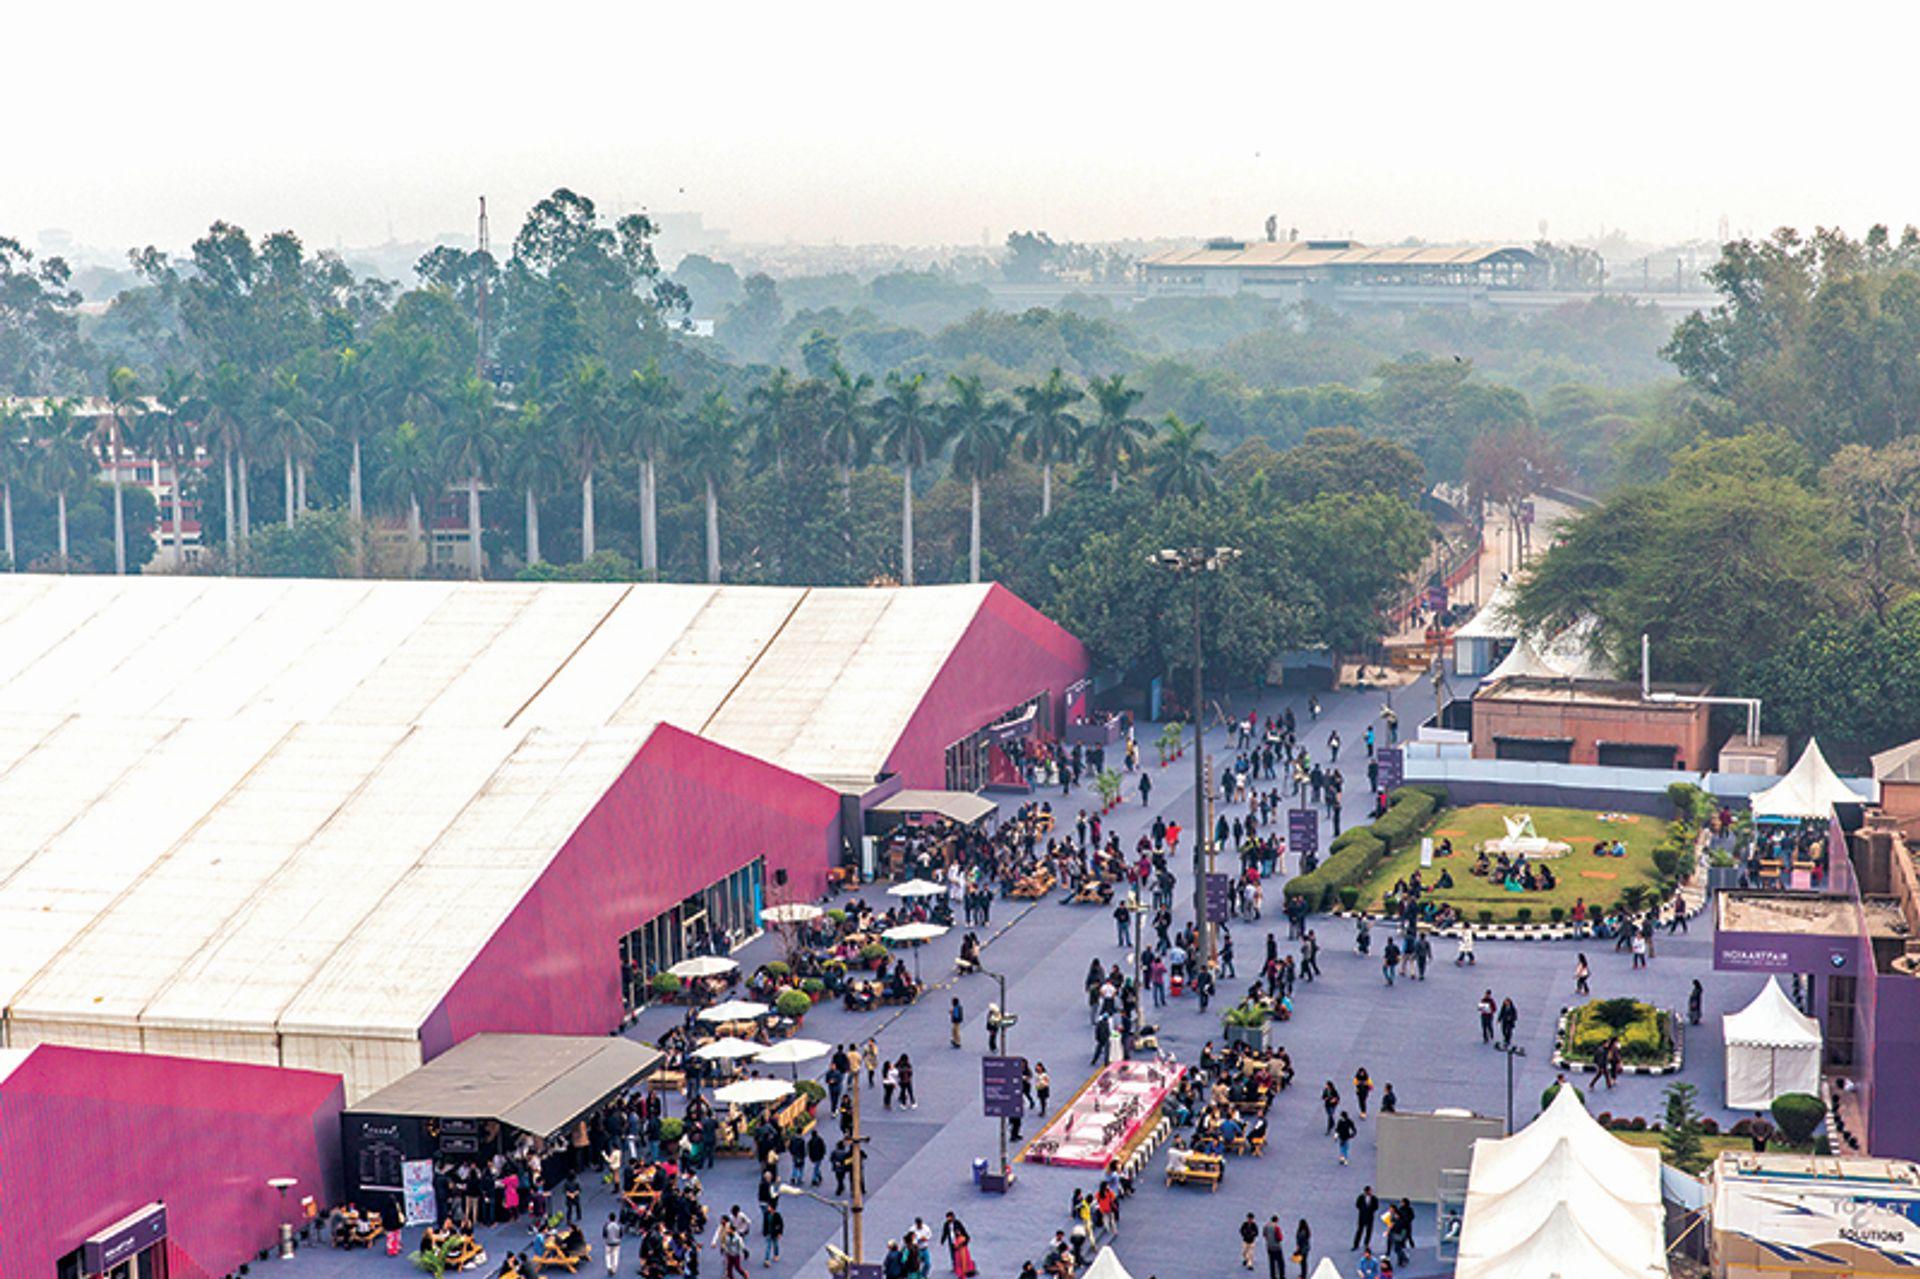 India Art Fair attracted more than 90,000 visitors last year Andy Barnham/India Art Fair